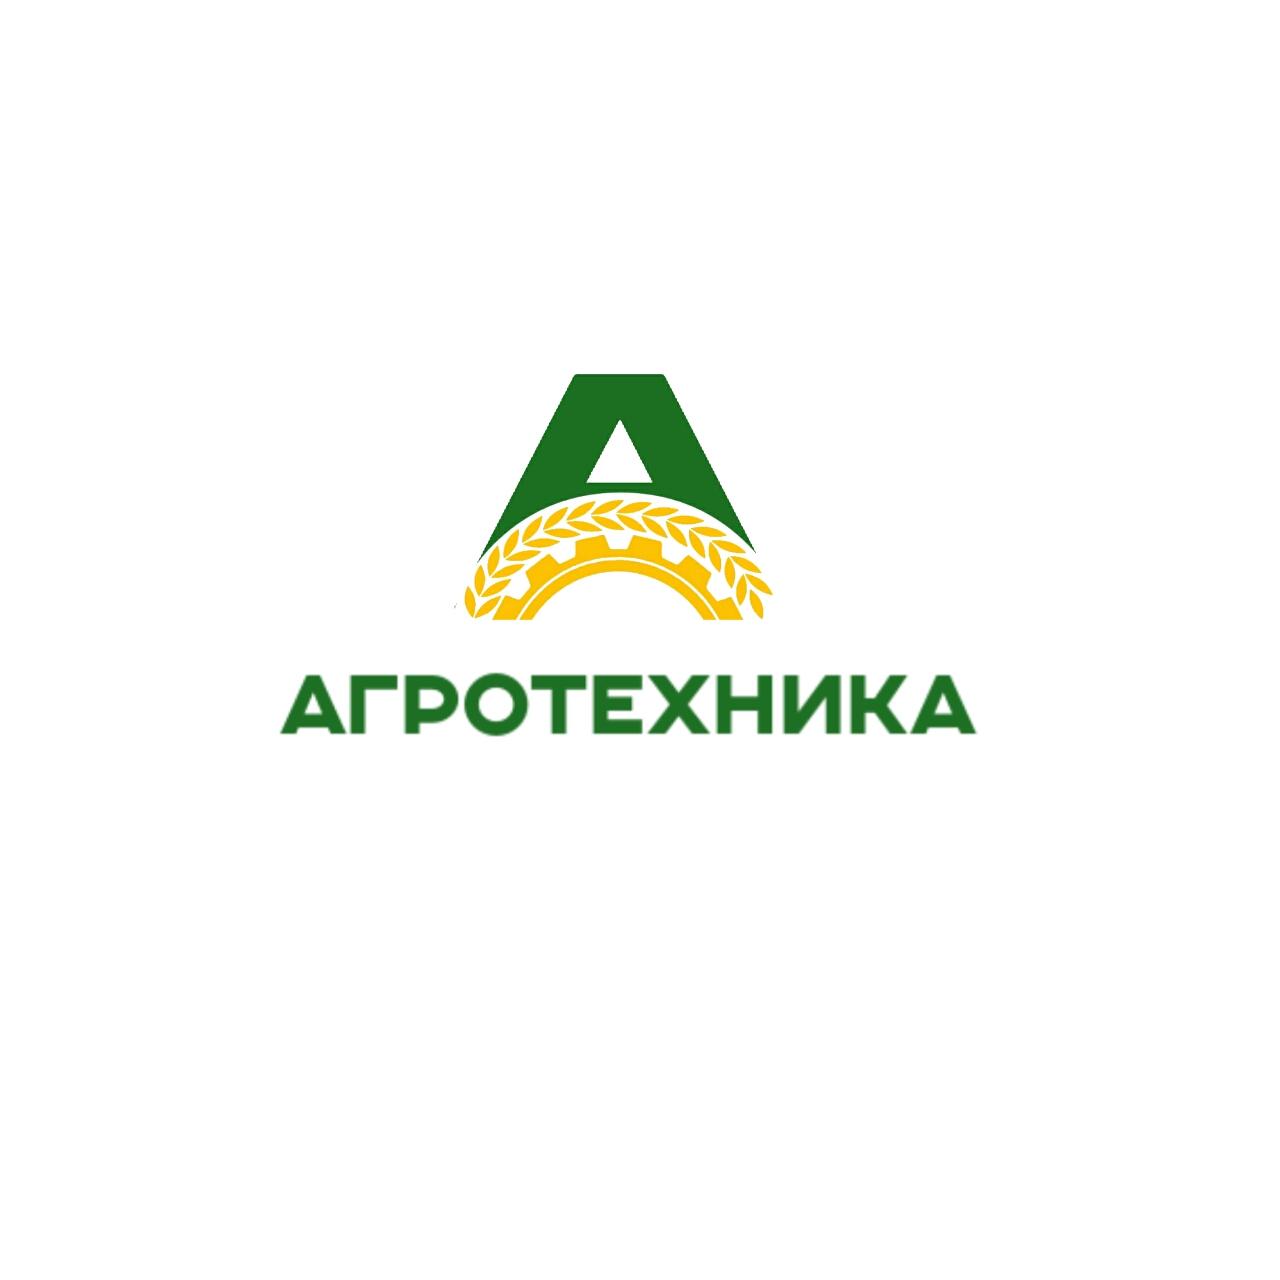 Разработка логотипа для компании Агротехника фото f_4515c002ebf60b9b.jpg